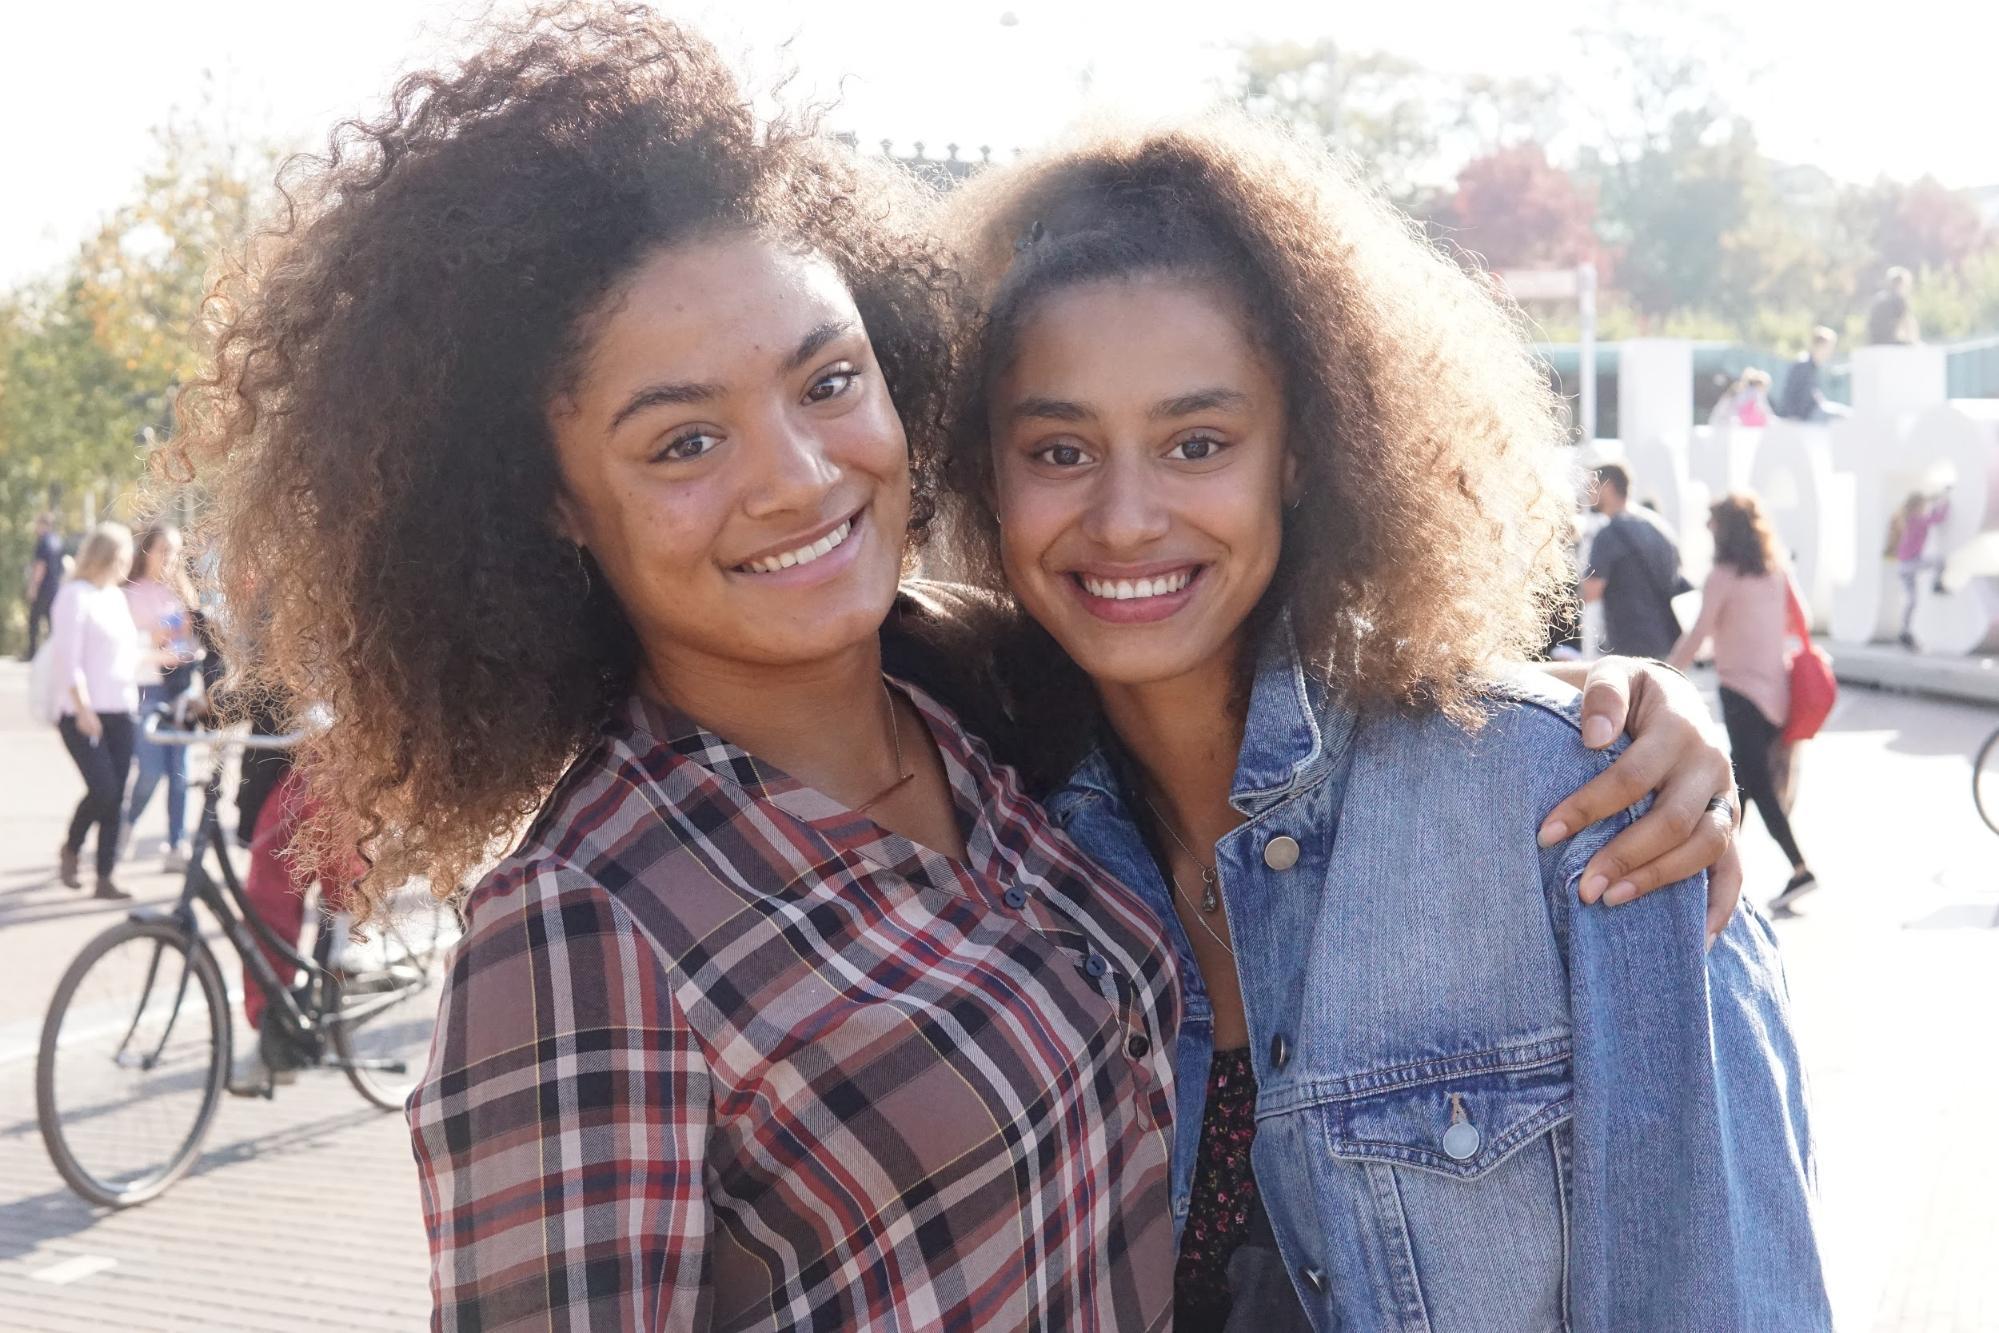 Iva (23) & Yendi (19)